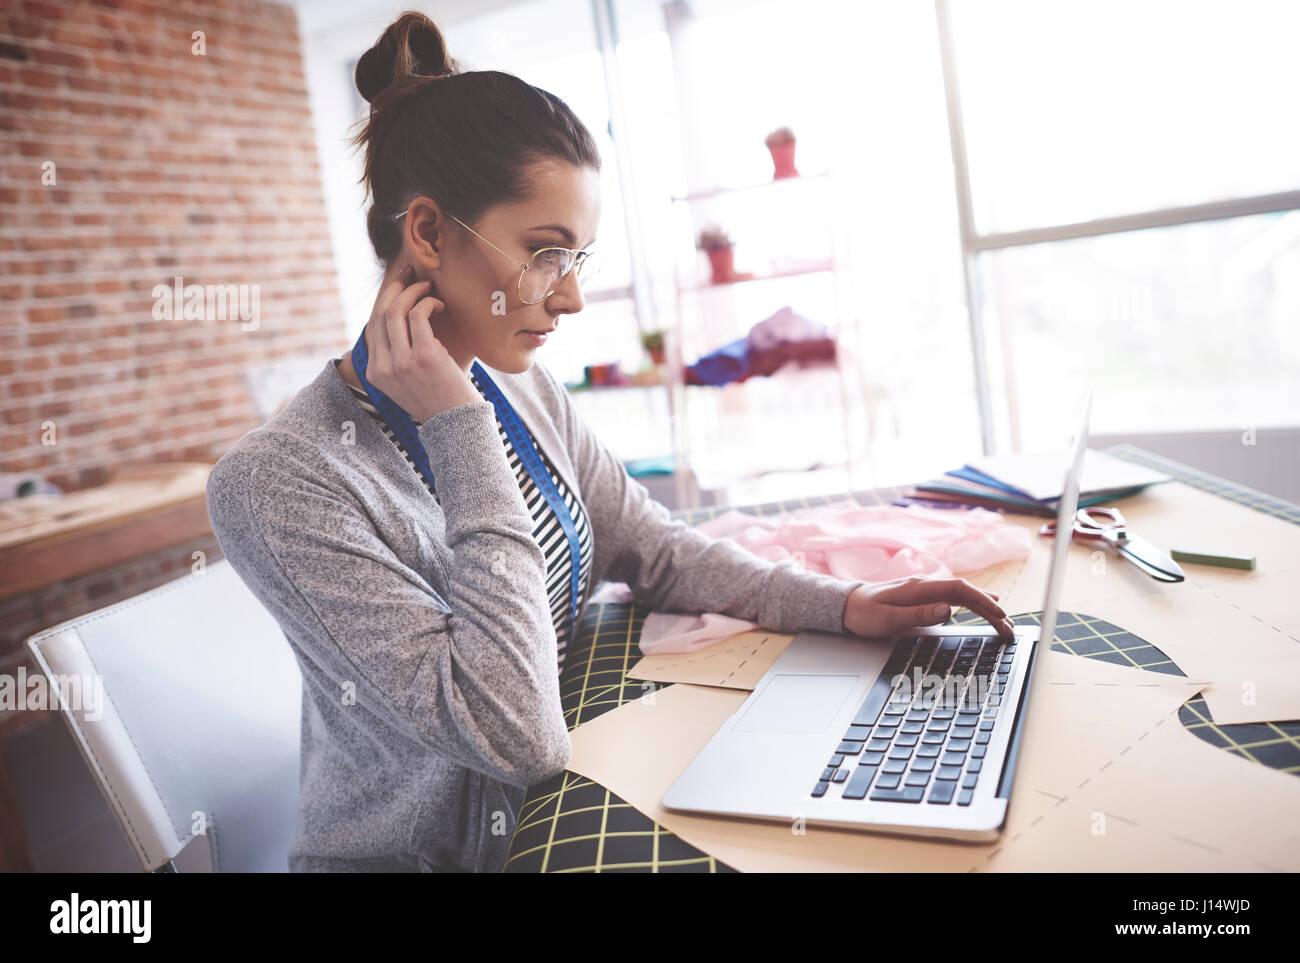 Clothing designer working on laptop - Stock Image